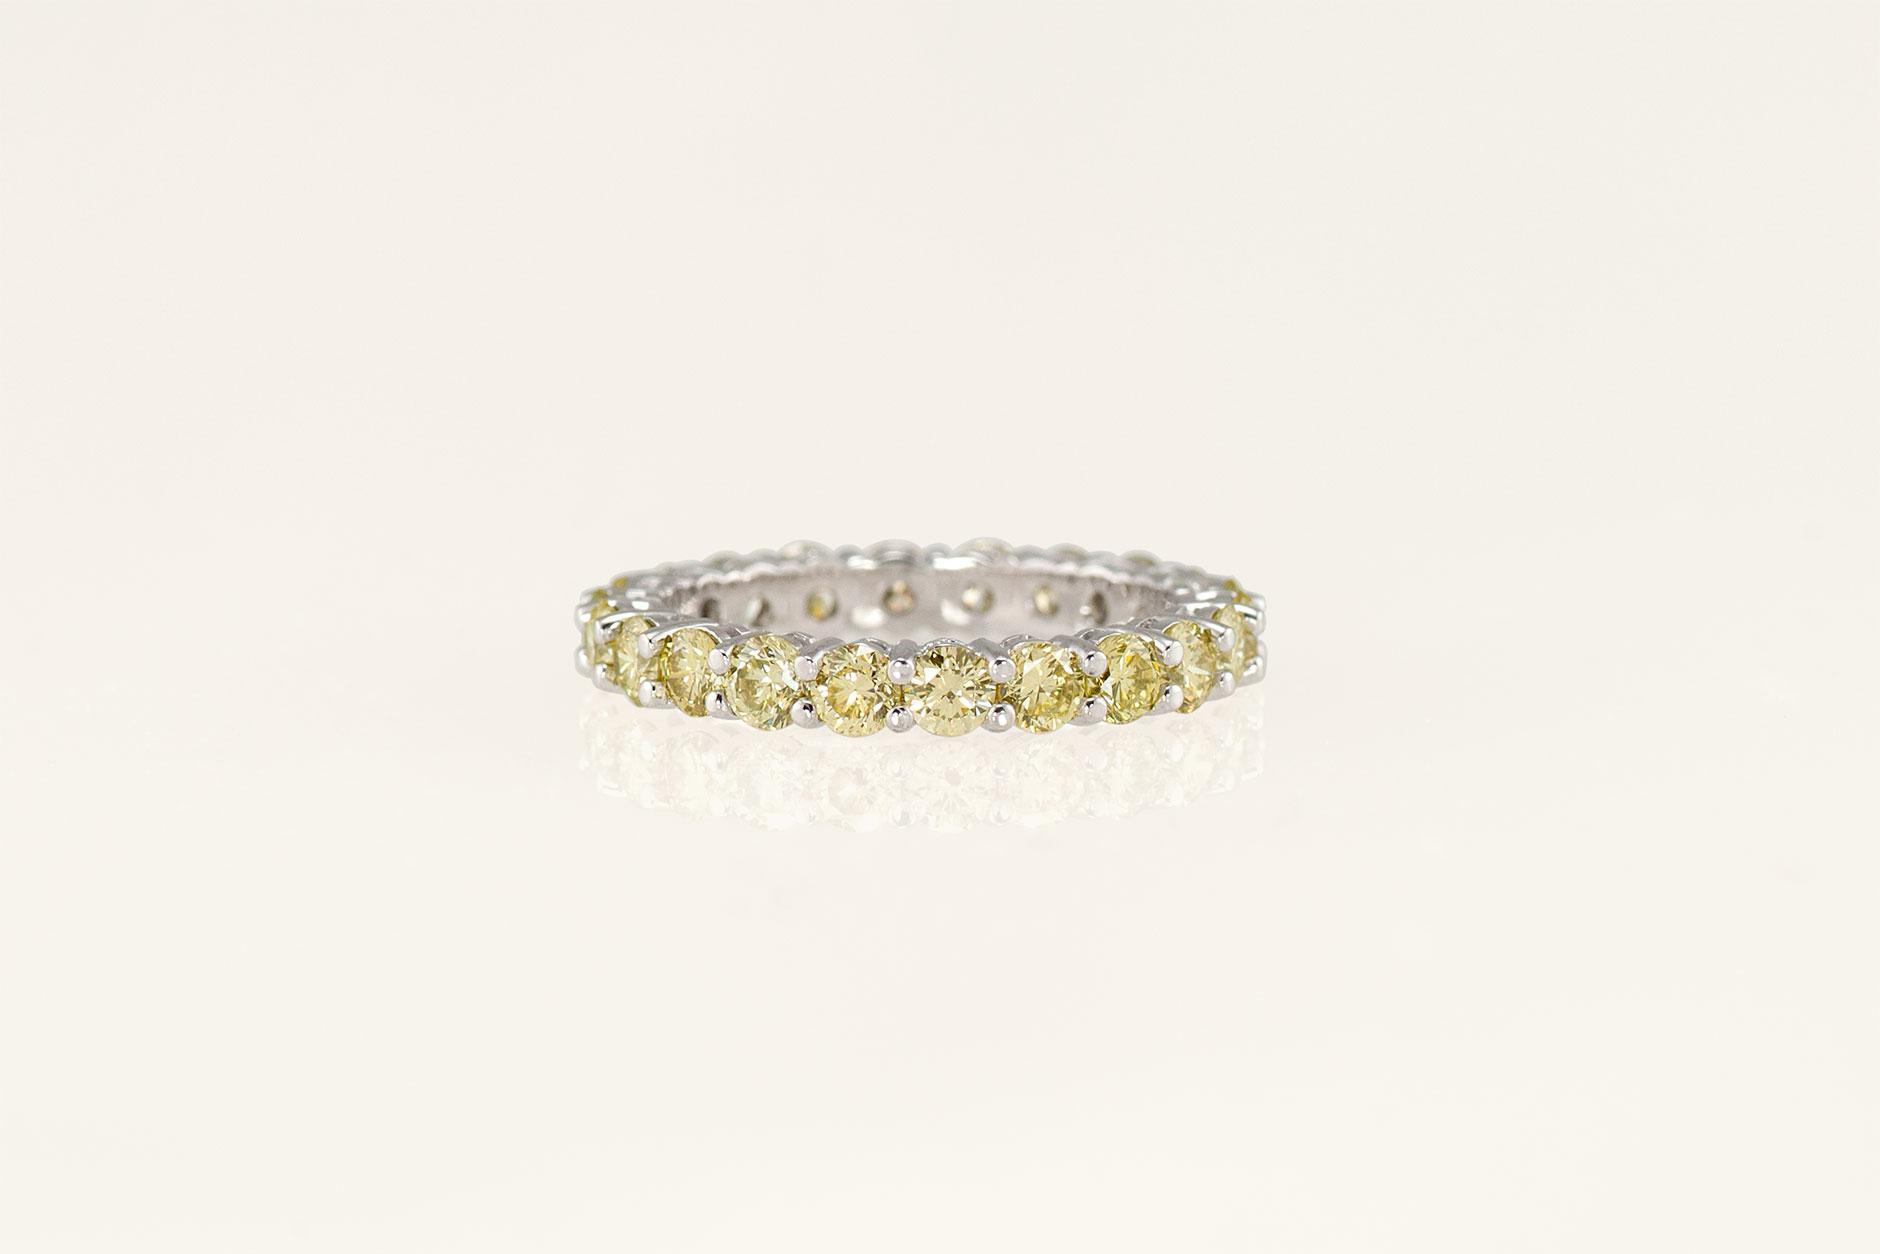 19k White Gold Basket Set Handmade Yellow Diamond Eternity Ring - NEWA Goldsmith